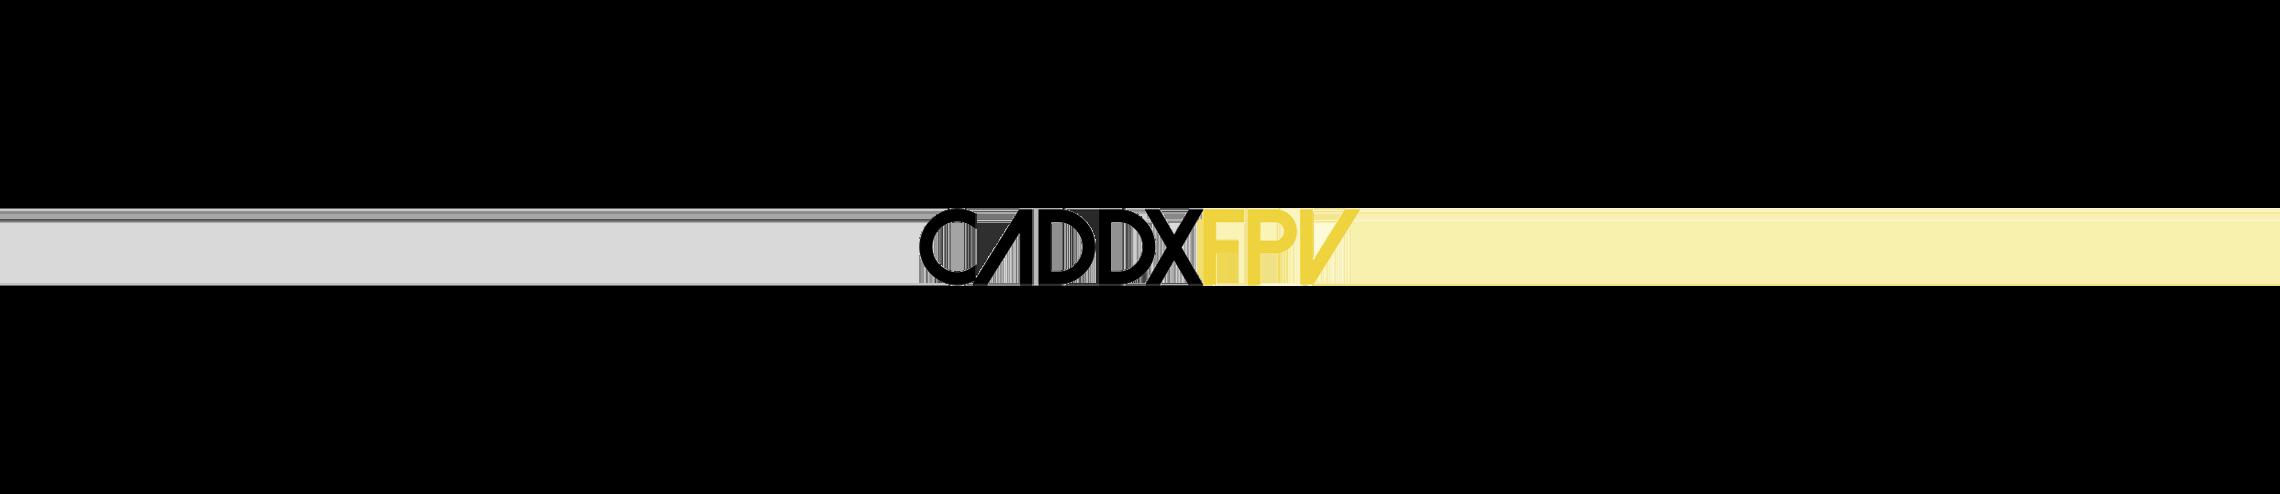 caddxfpv fpv banner promotion shop description mantisfpv